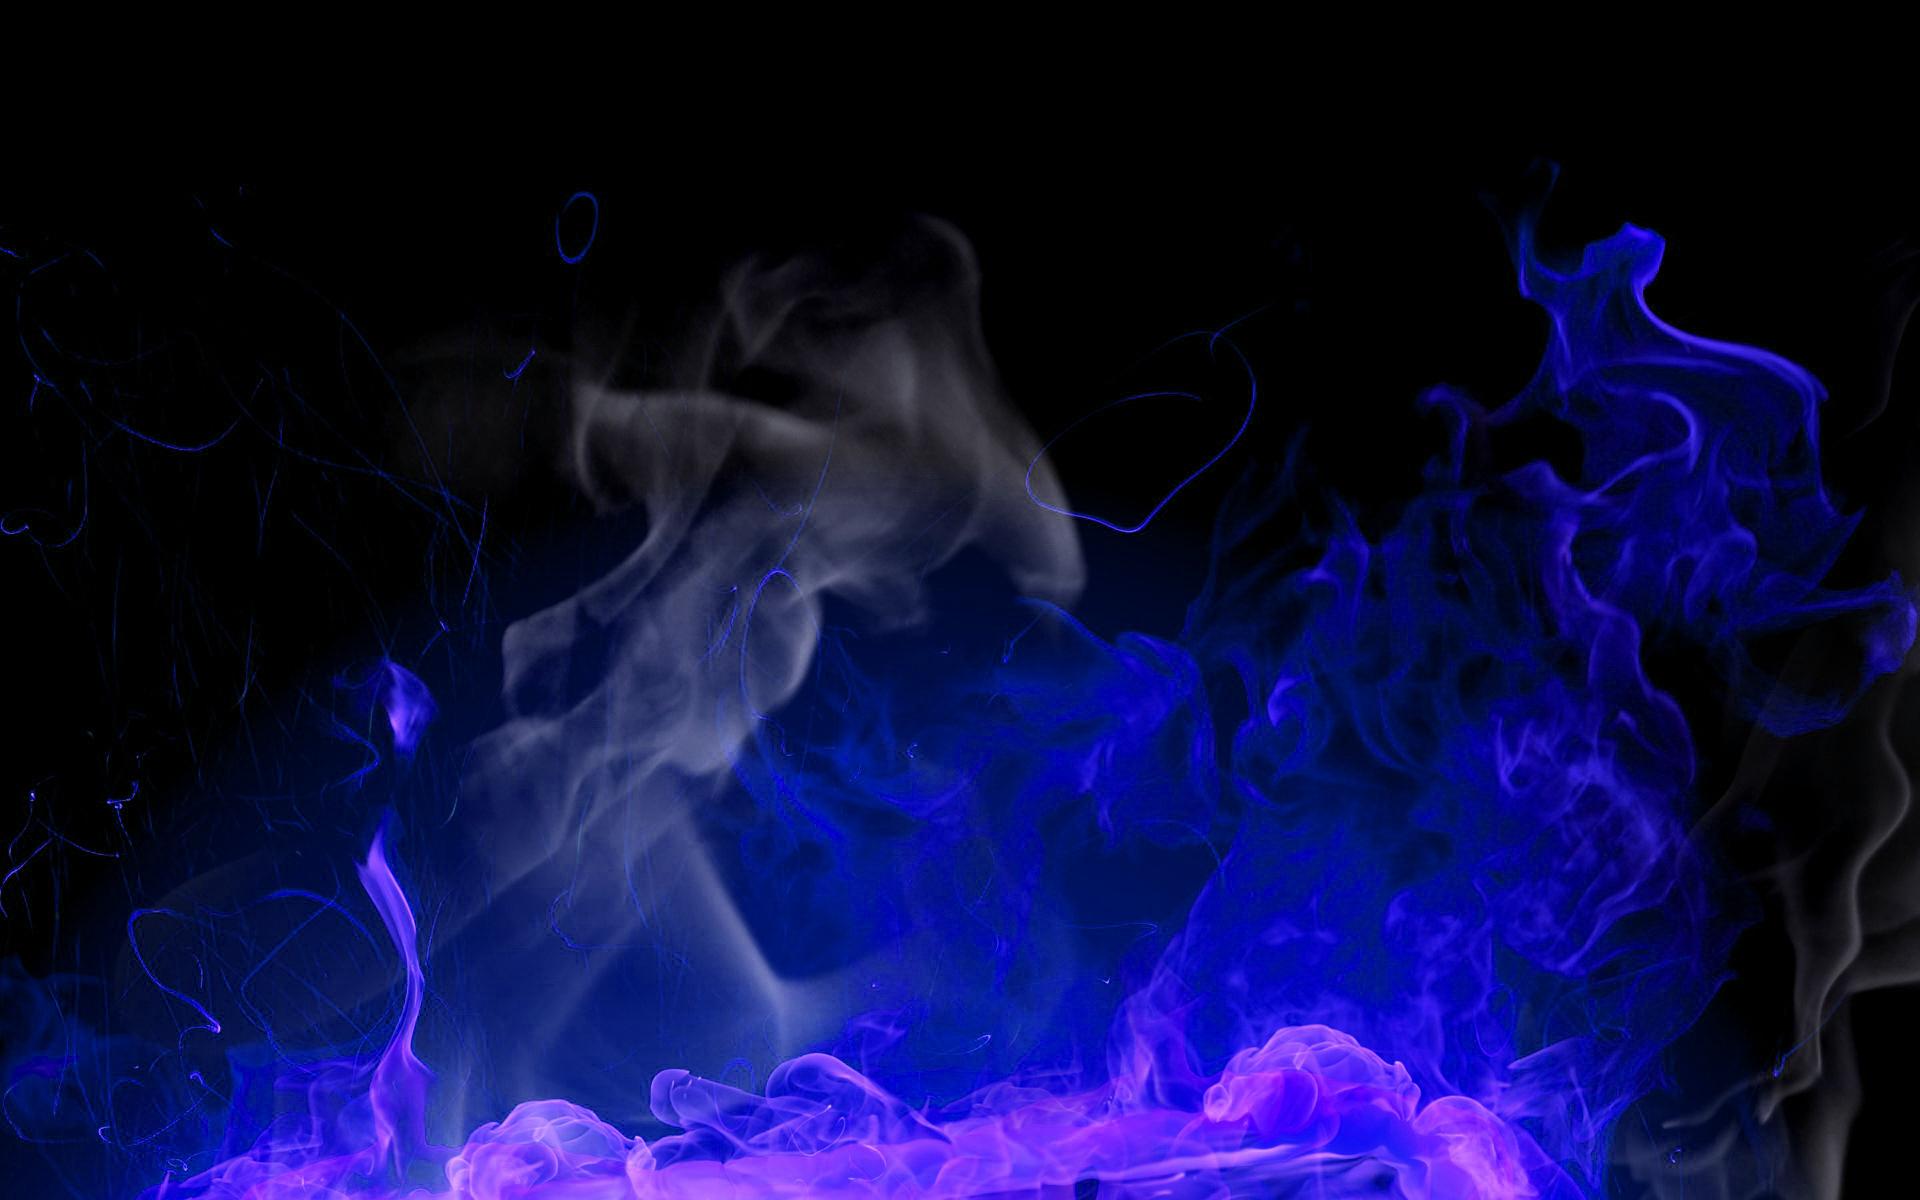 Download Wallpaper High Resolution Fire - 151786  Pic_17170.jpg